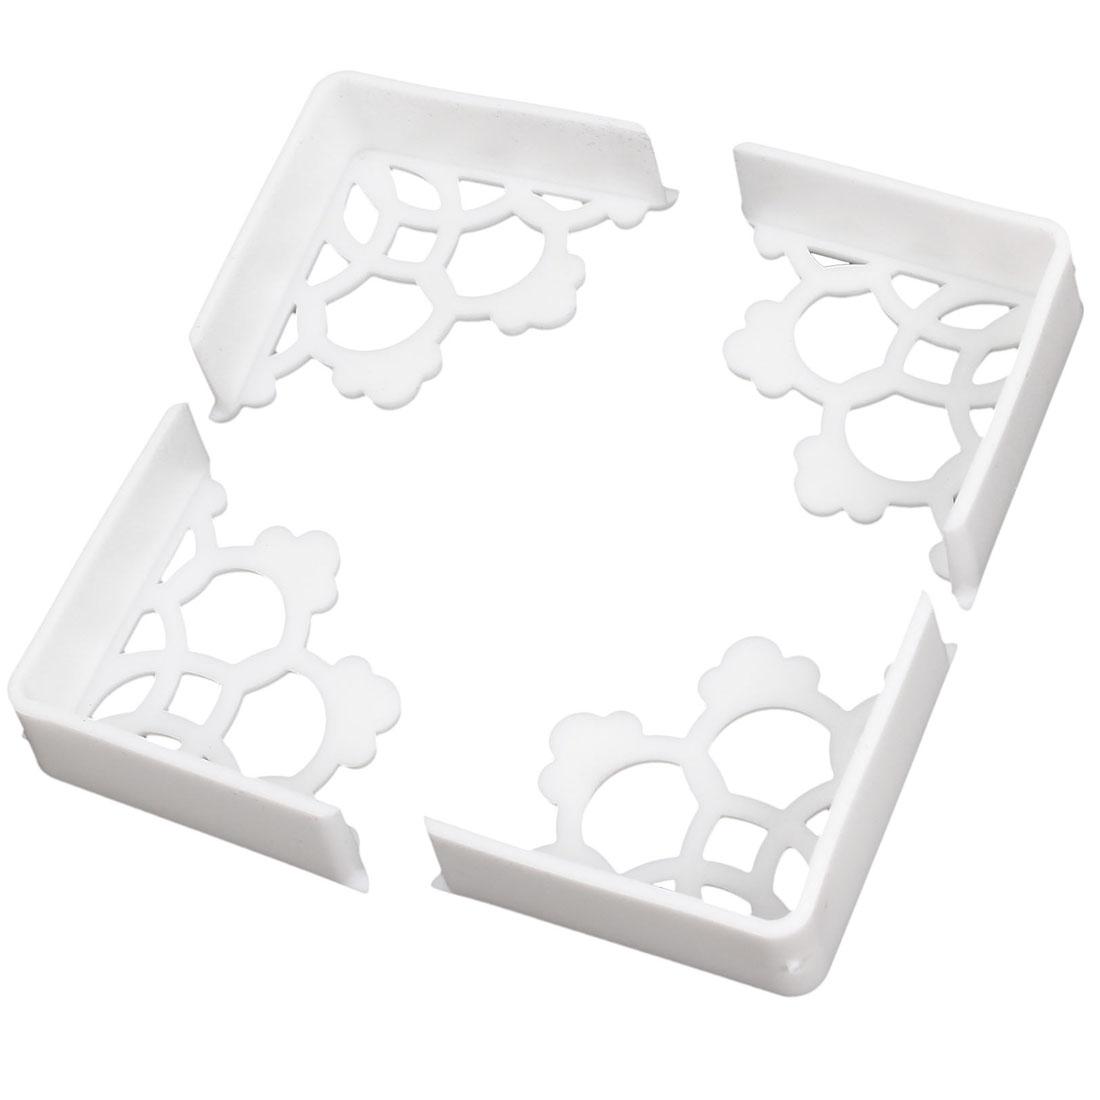 4 Pcs Rubber Flower Design Corner Edge Cushion Desk Table Cover Protector White